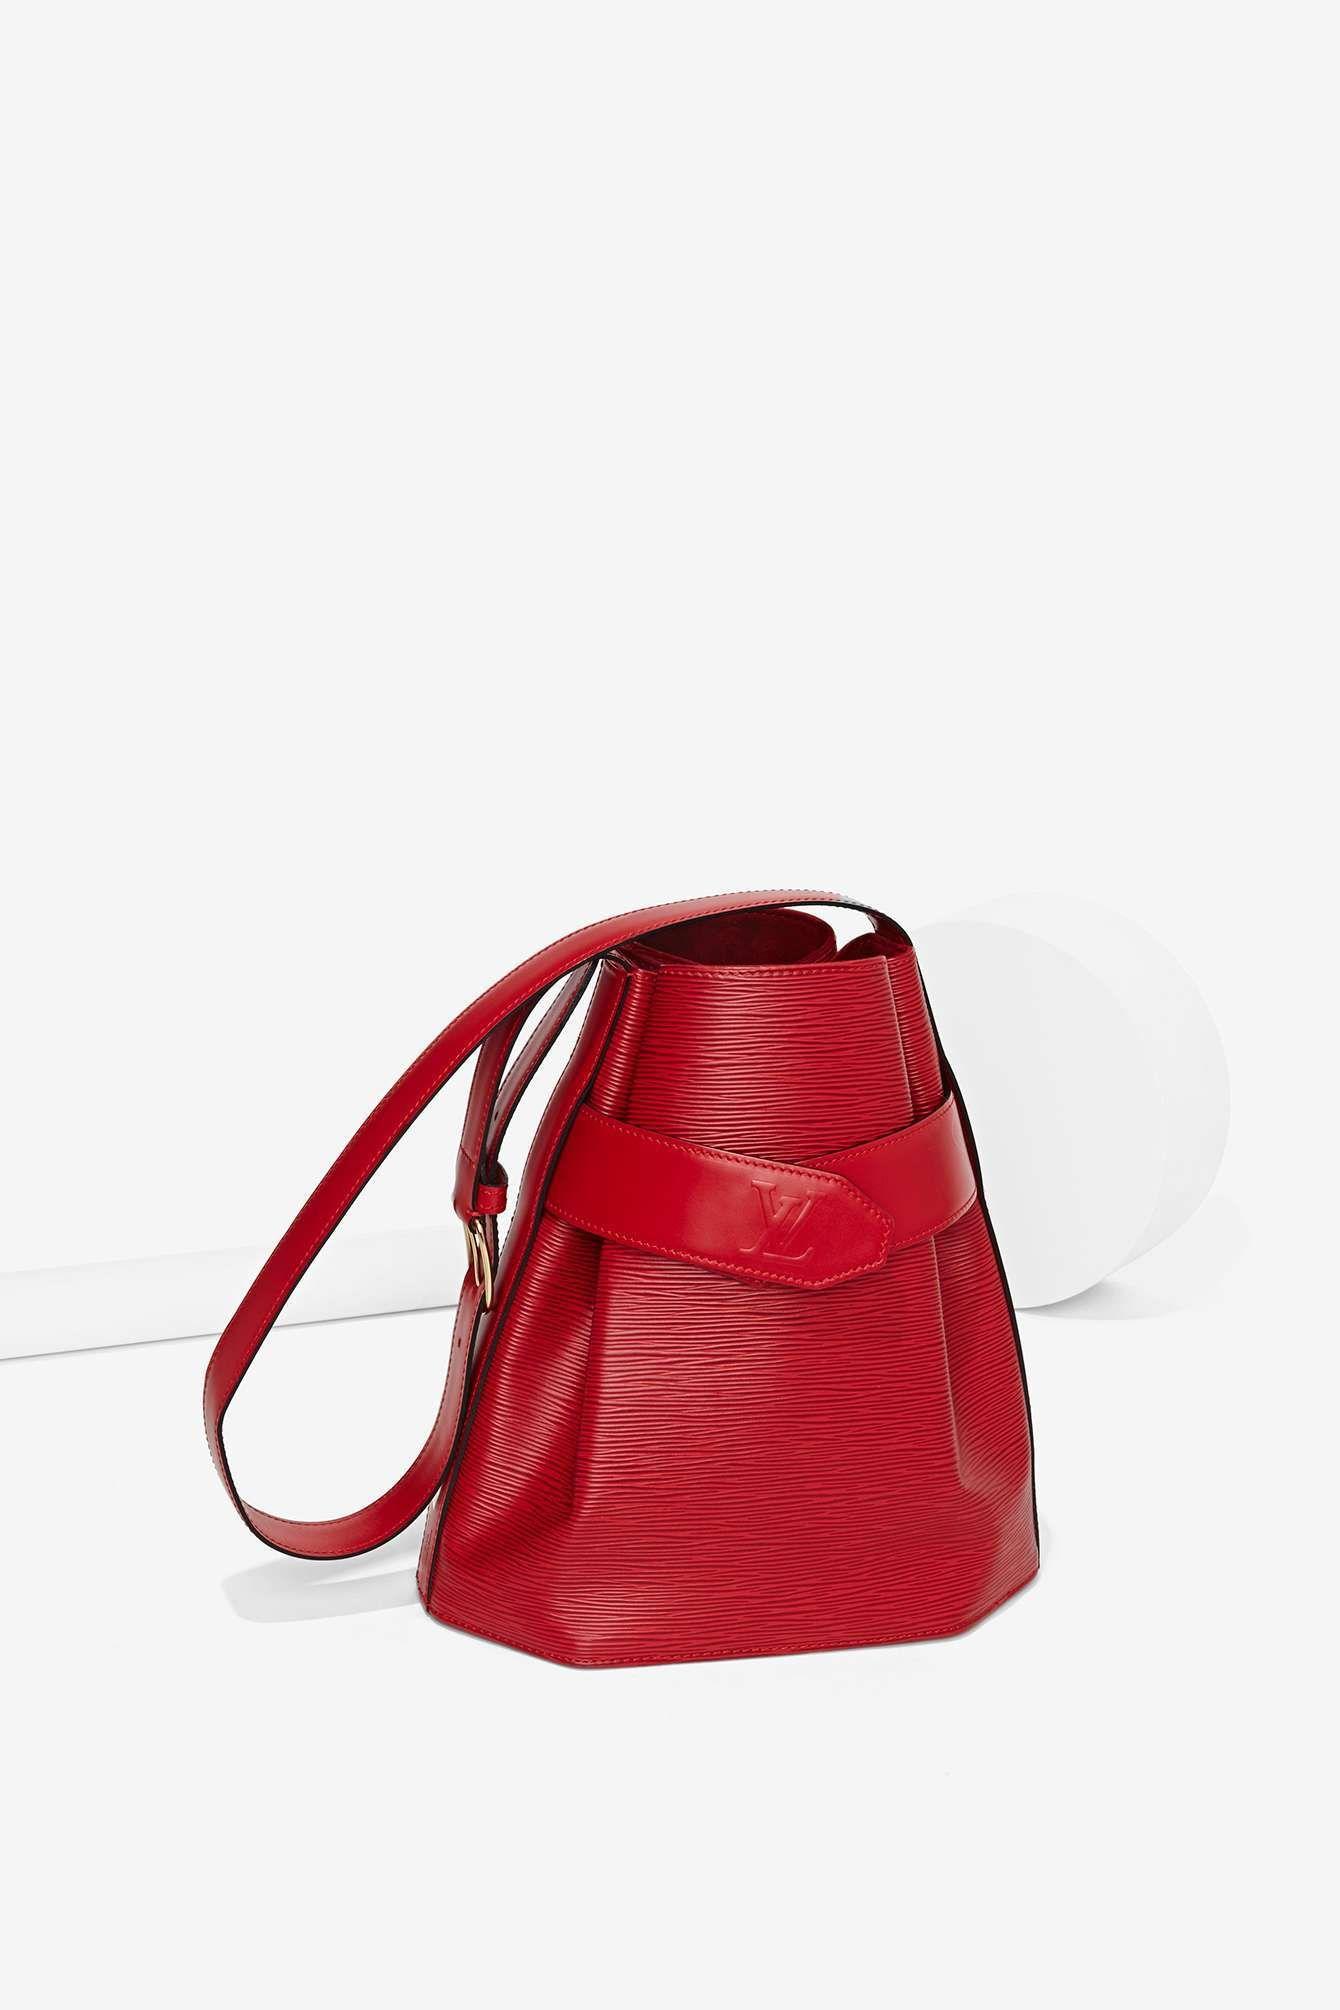 59f2ddbc696e Vintage Louis Vuitton Sac D Epaule Epi Leather Bag - Red